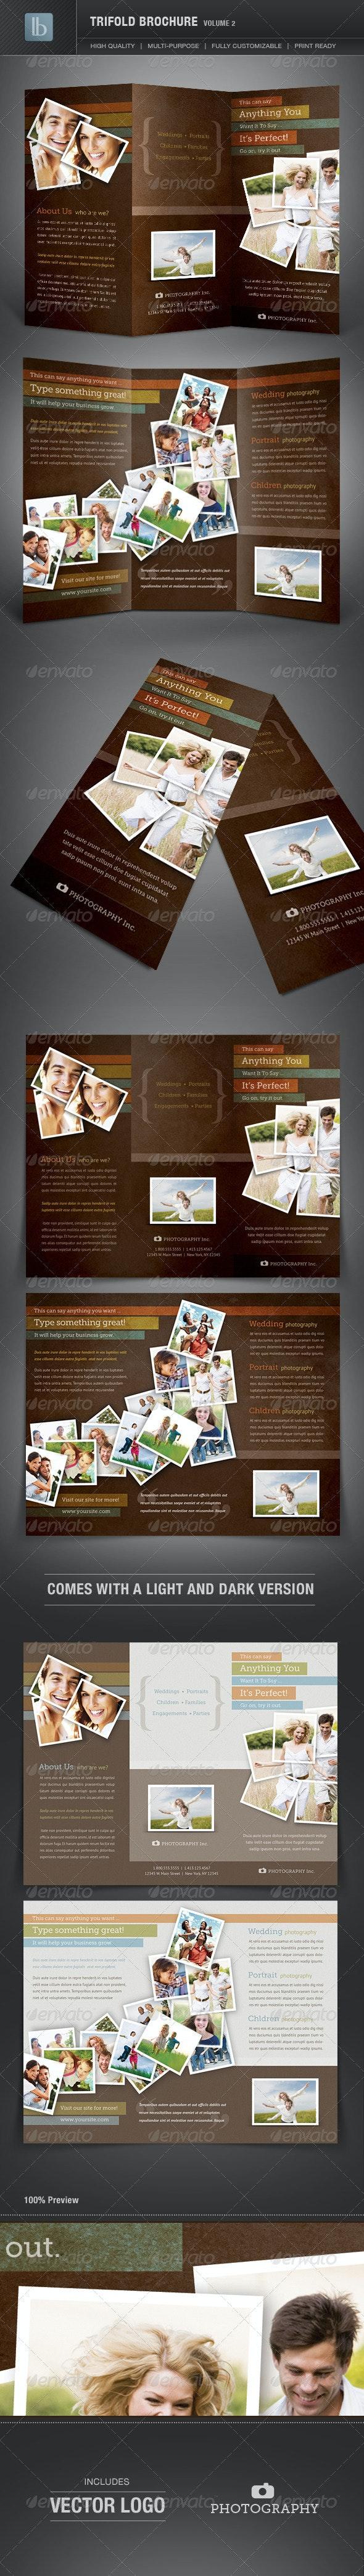 Trifold Brochure   Volume 2 - Corporate Brochures